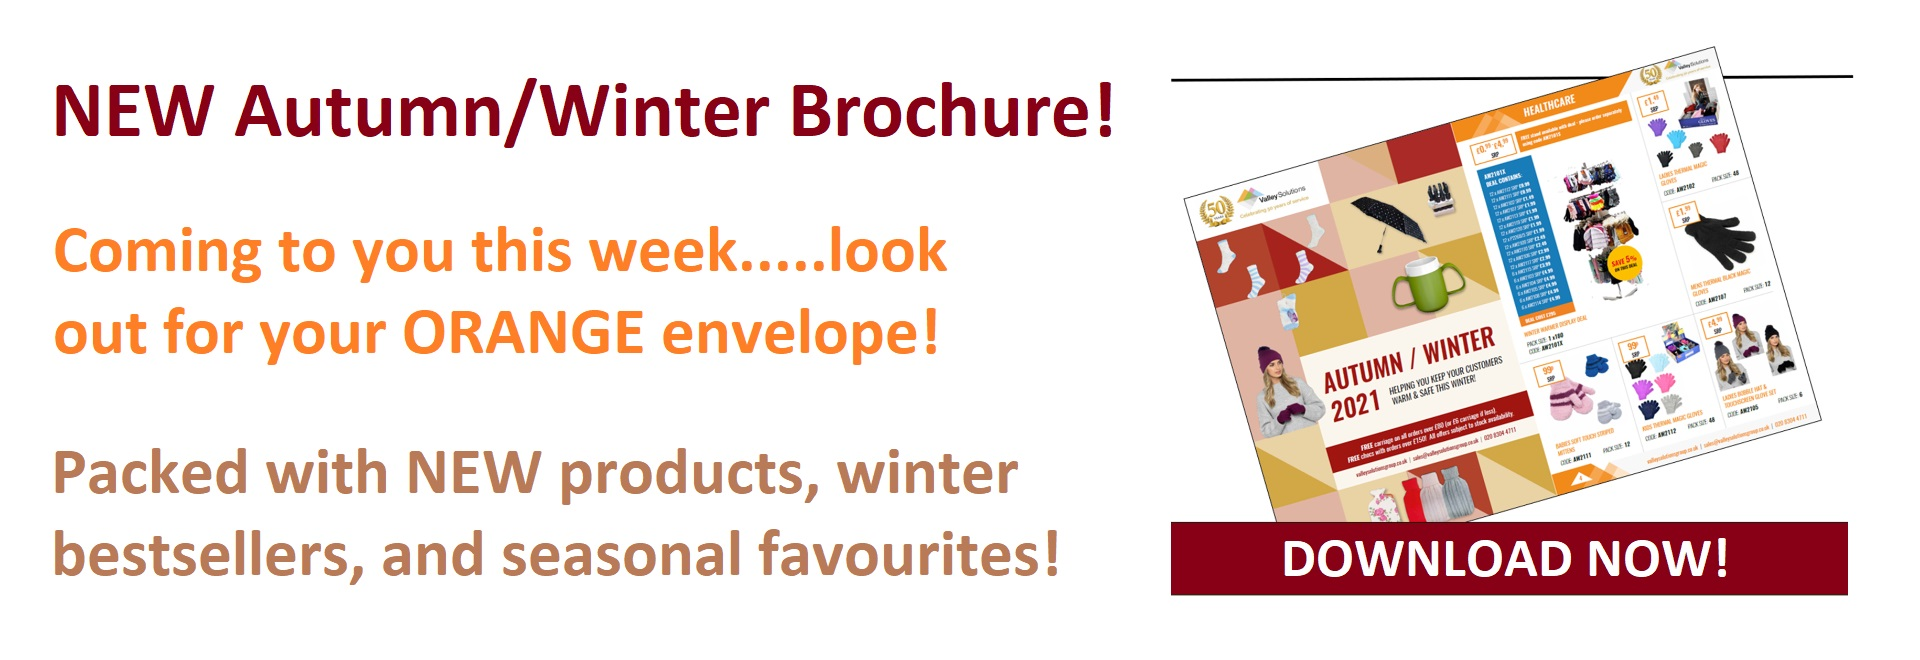 New autumn / winter Brochure